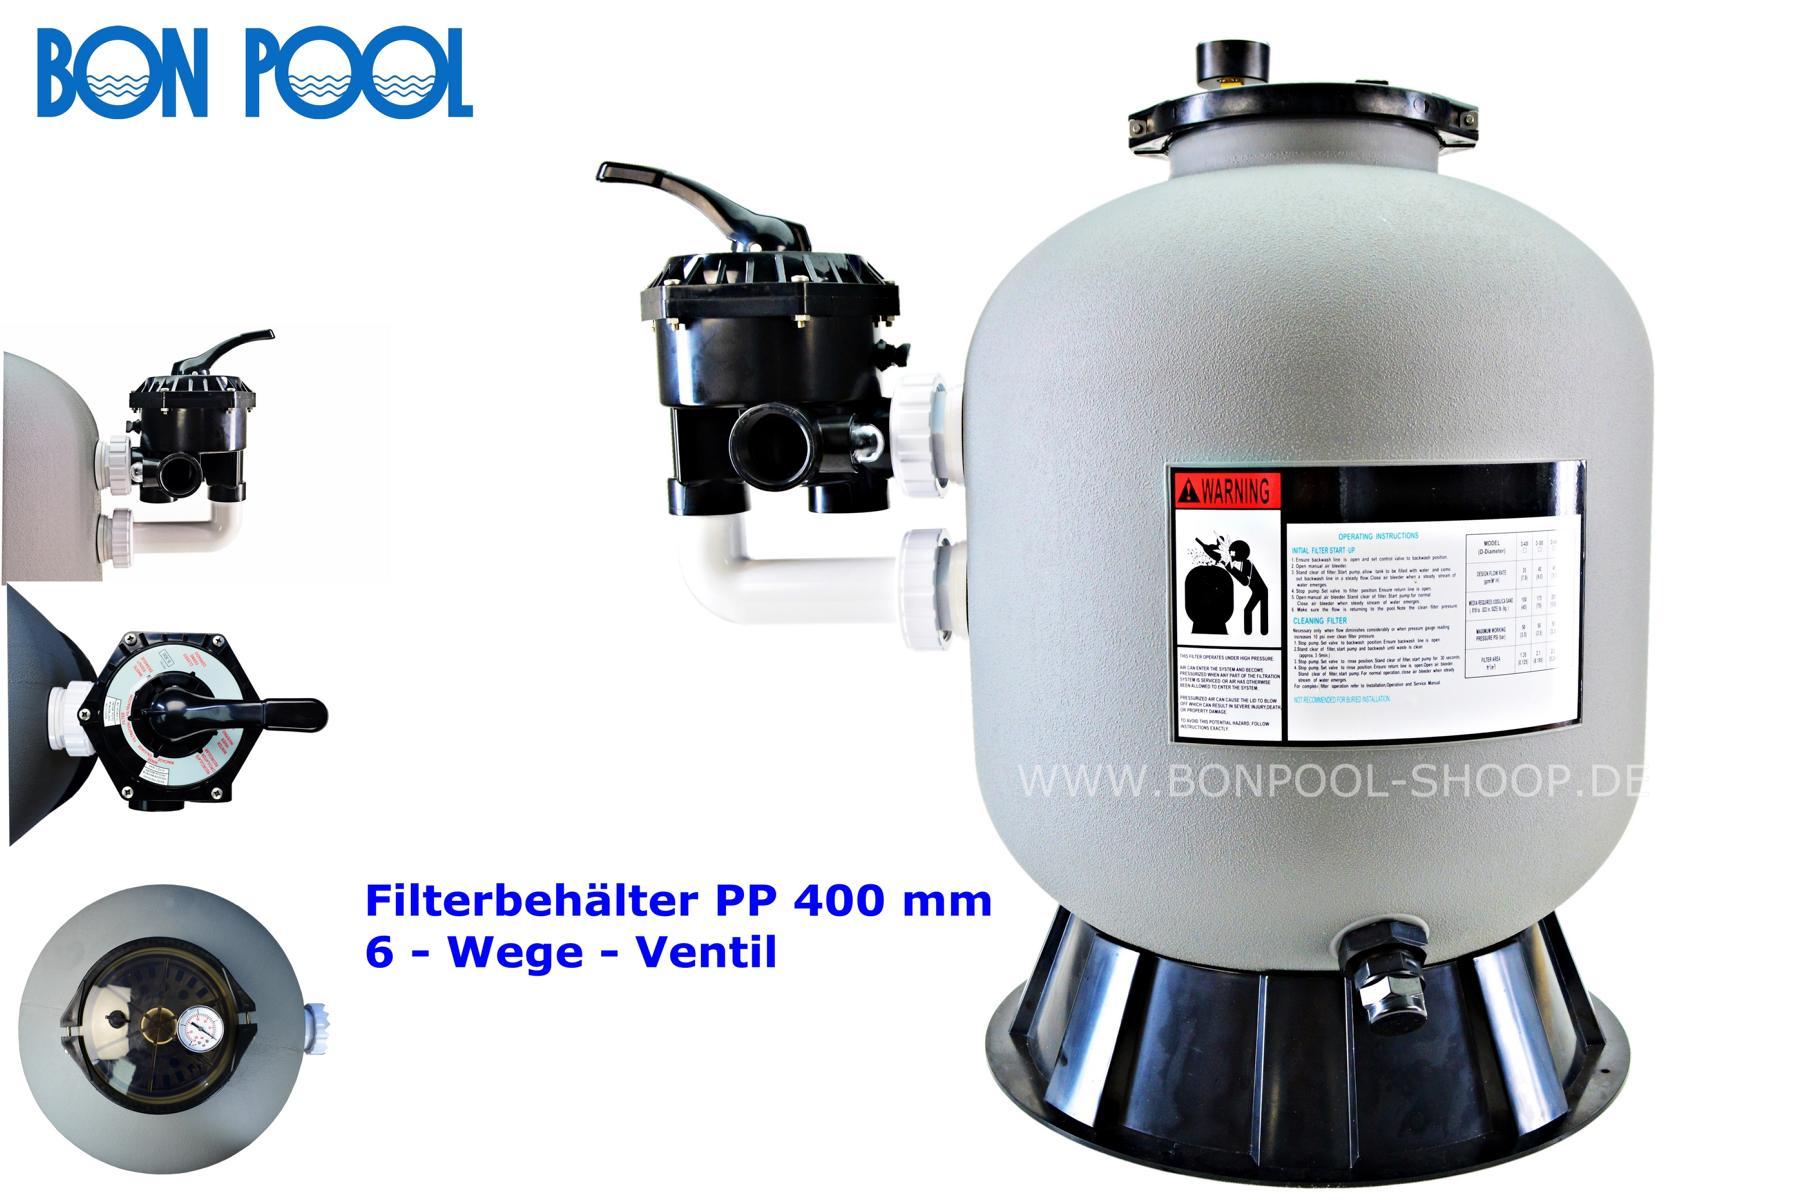 filterbeh lter hdpe 500 mmbon pool. Black Bedroom Furniture Sets. Home Design Ideas